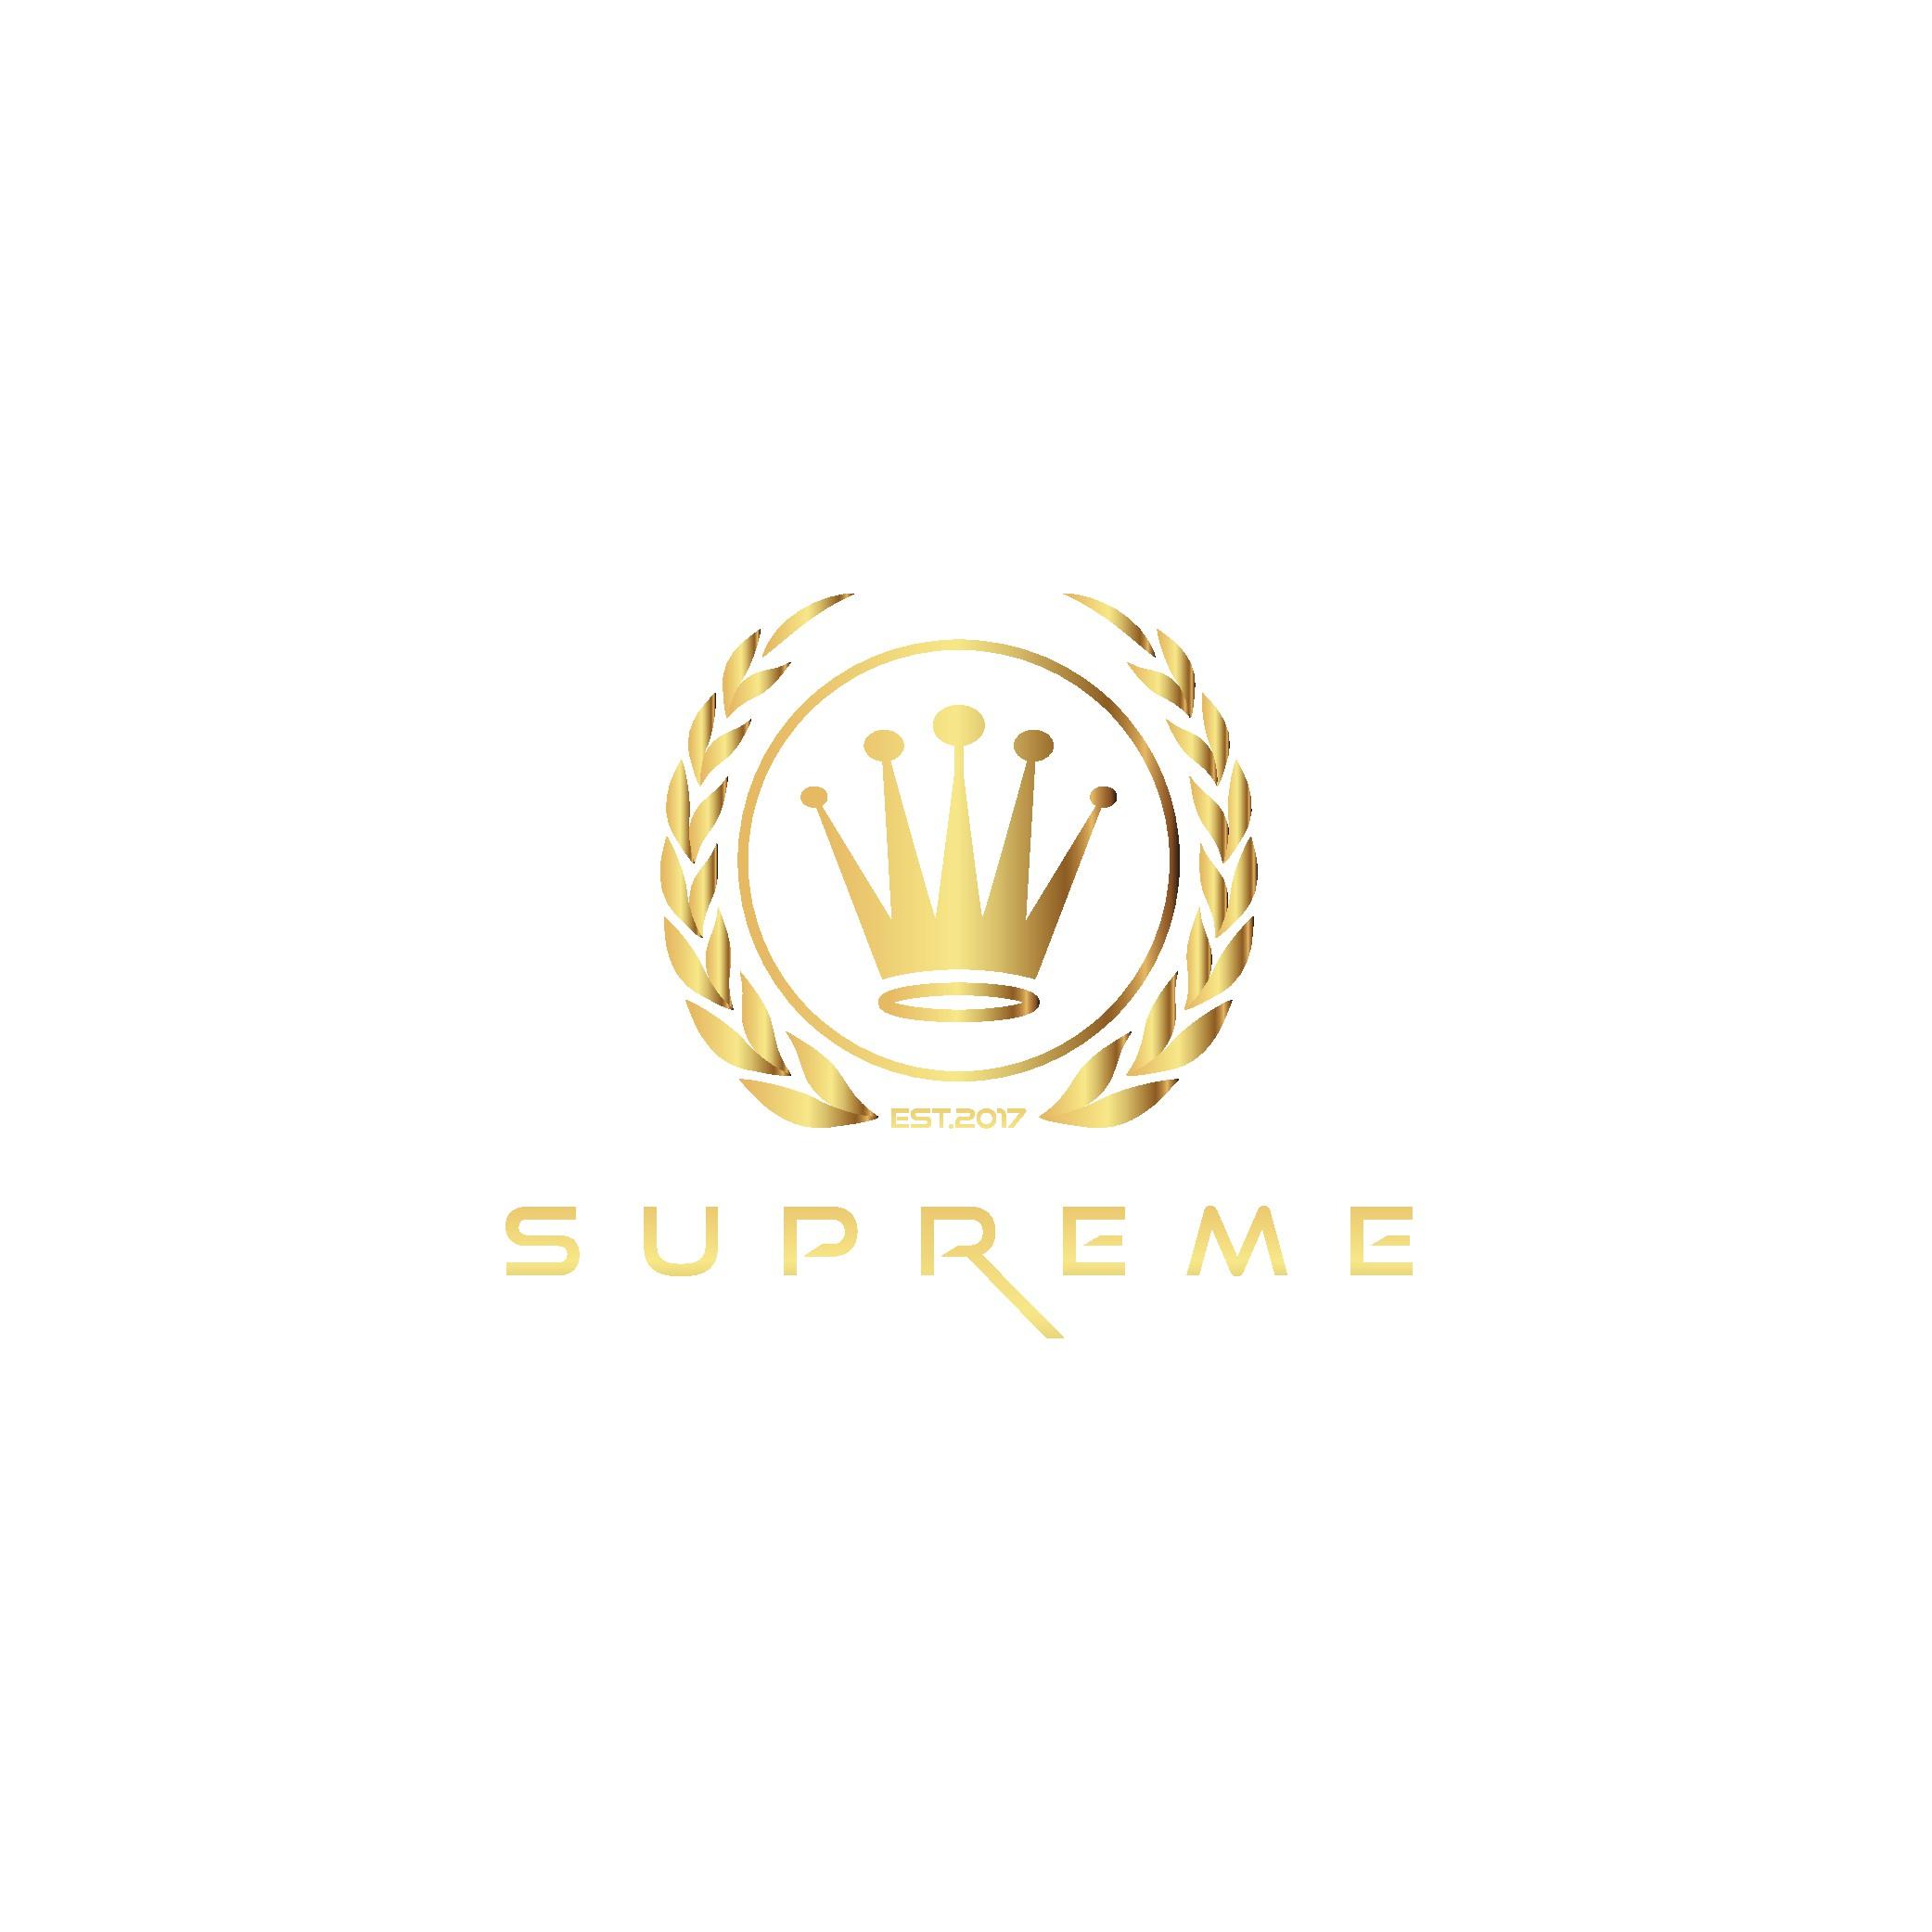 Supreme Vape Pens needs a hot new logo!